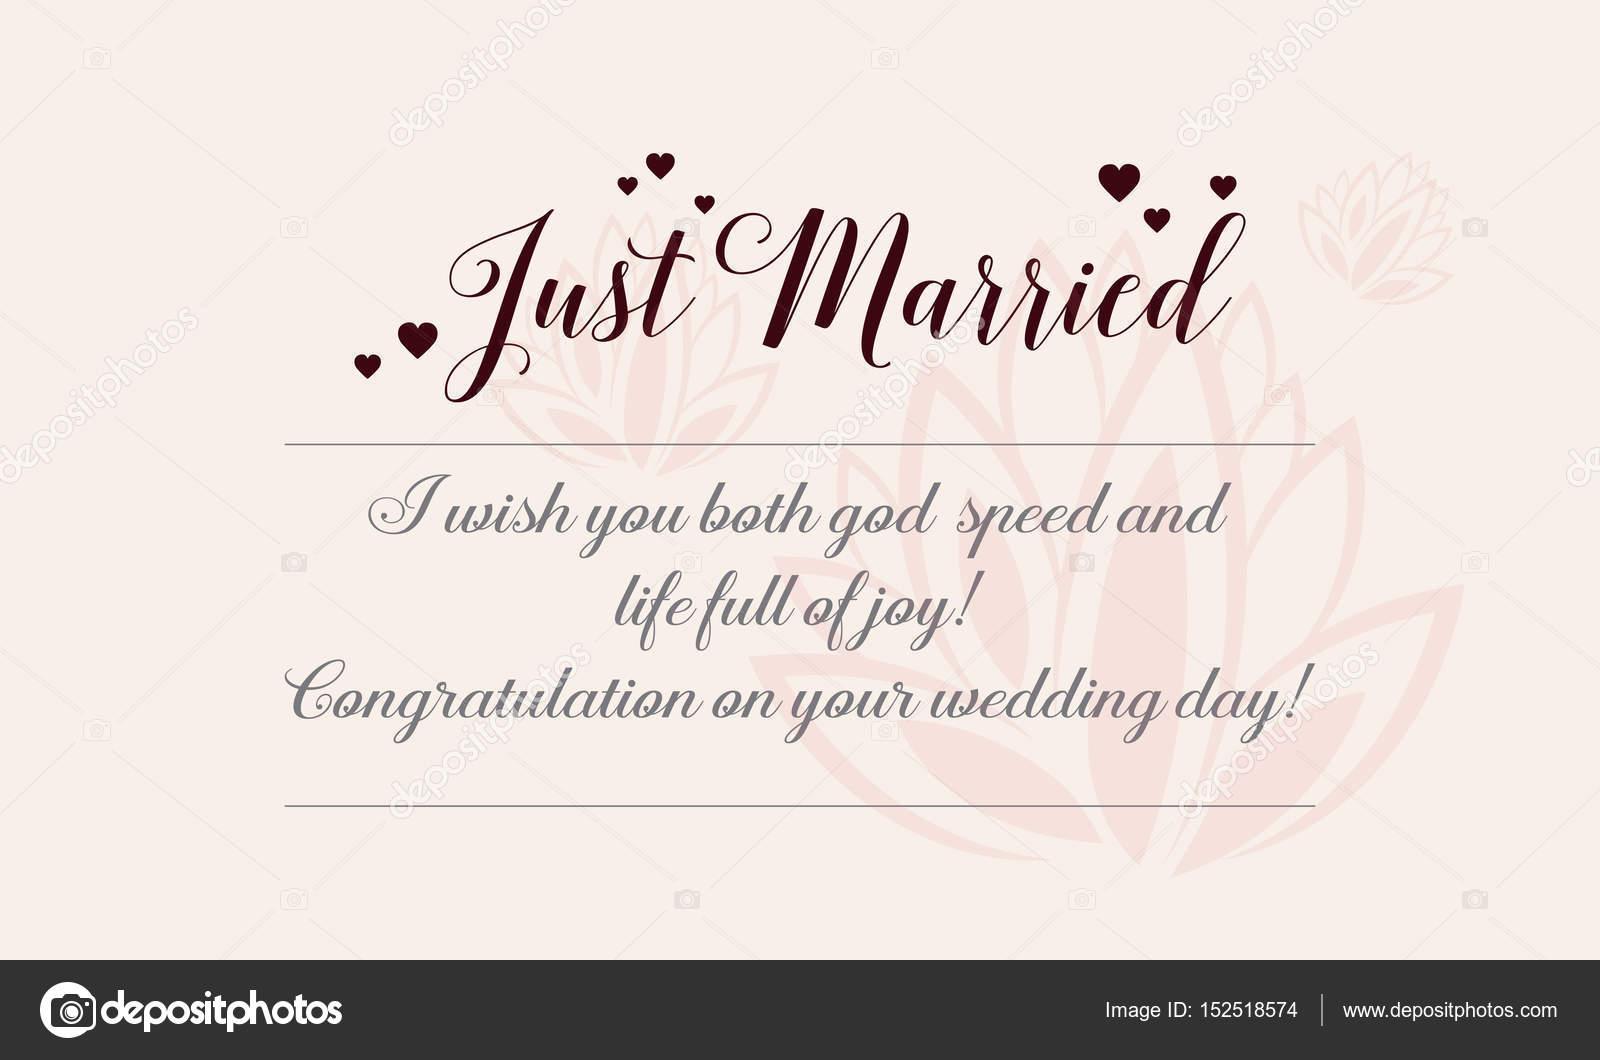 Happy wedding greeting card romantic theme stock vector happy wedding greeting card romantic theme stock vector m4hsunfo